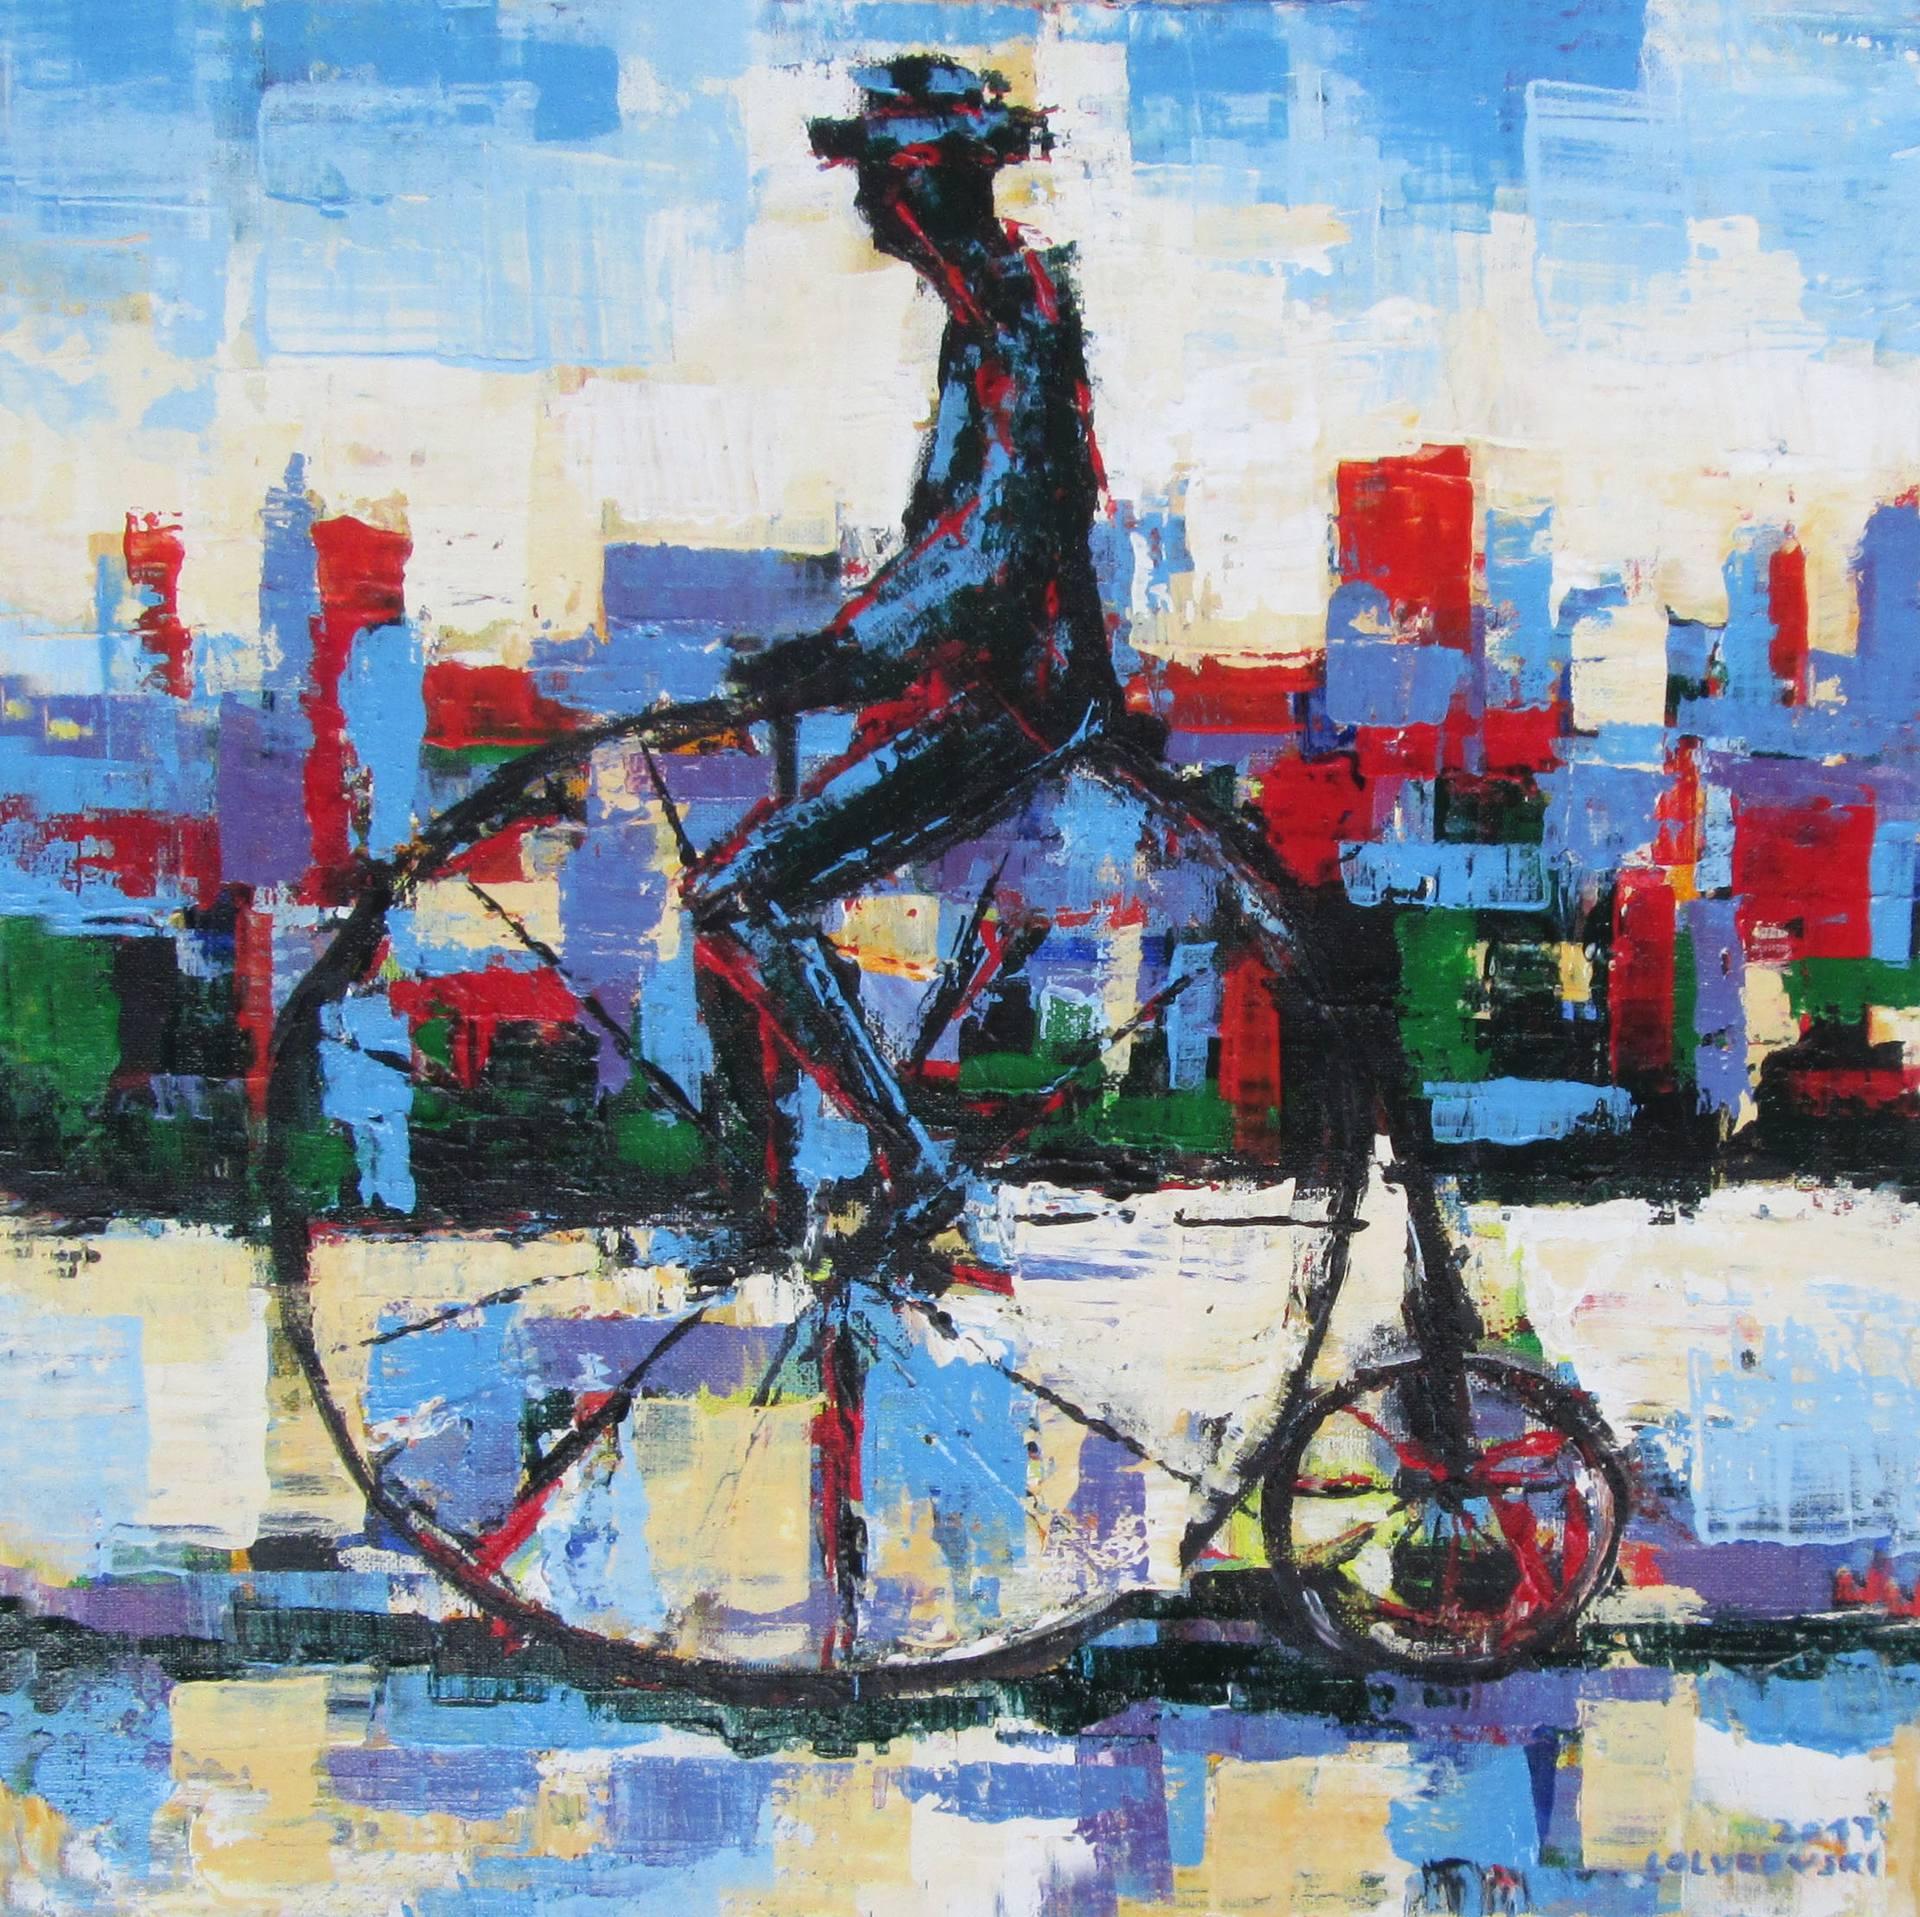 Risultati immagini per bicycle saatchi art